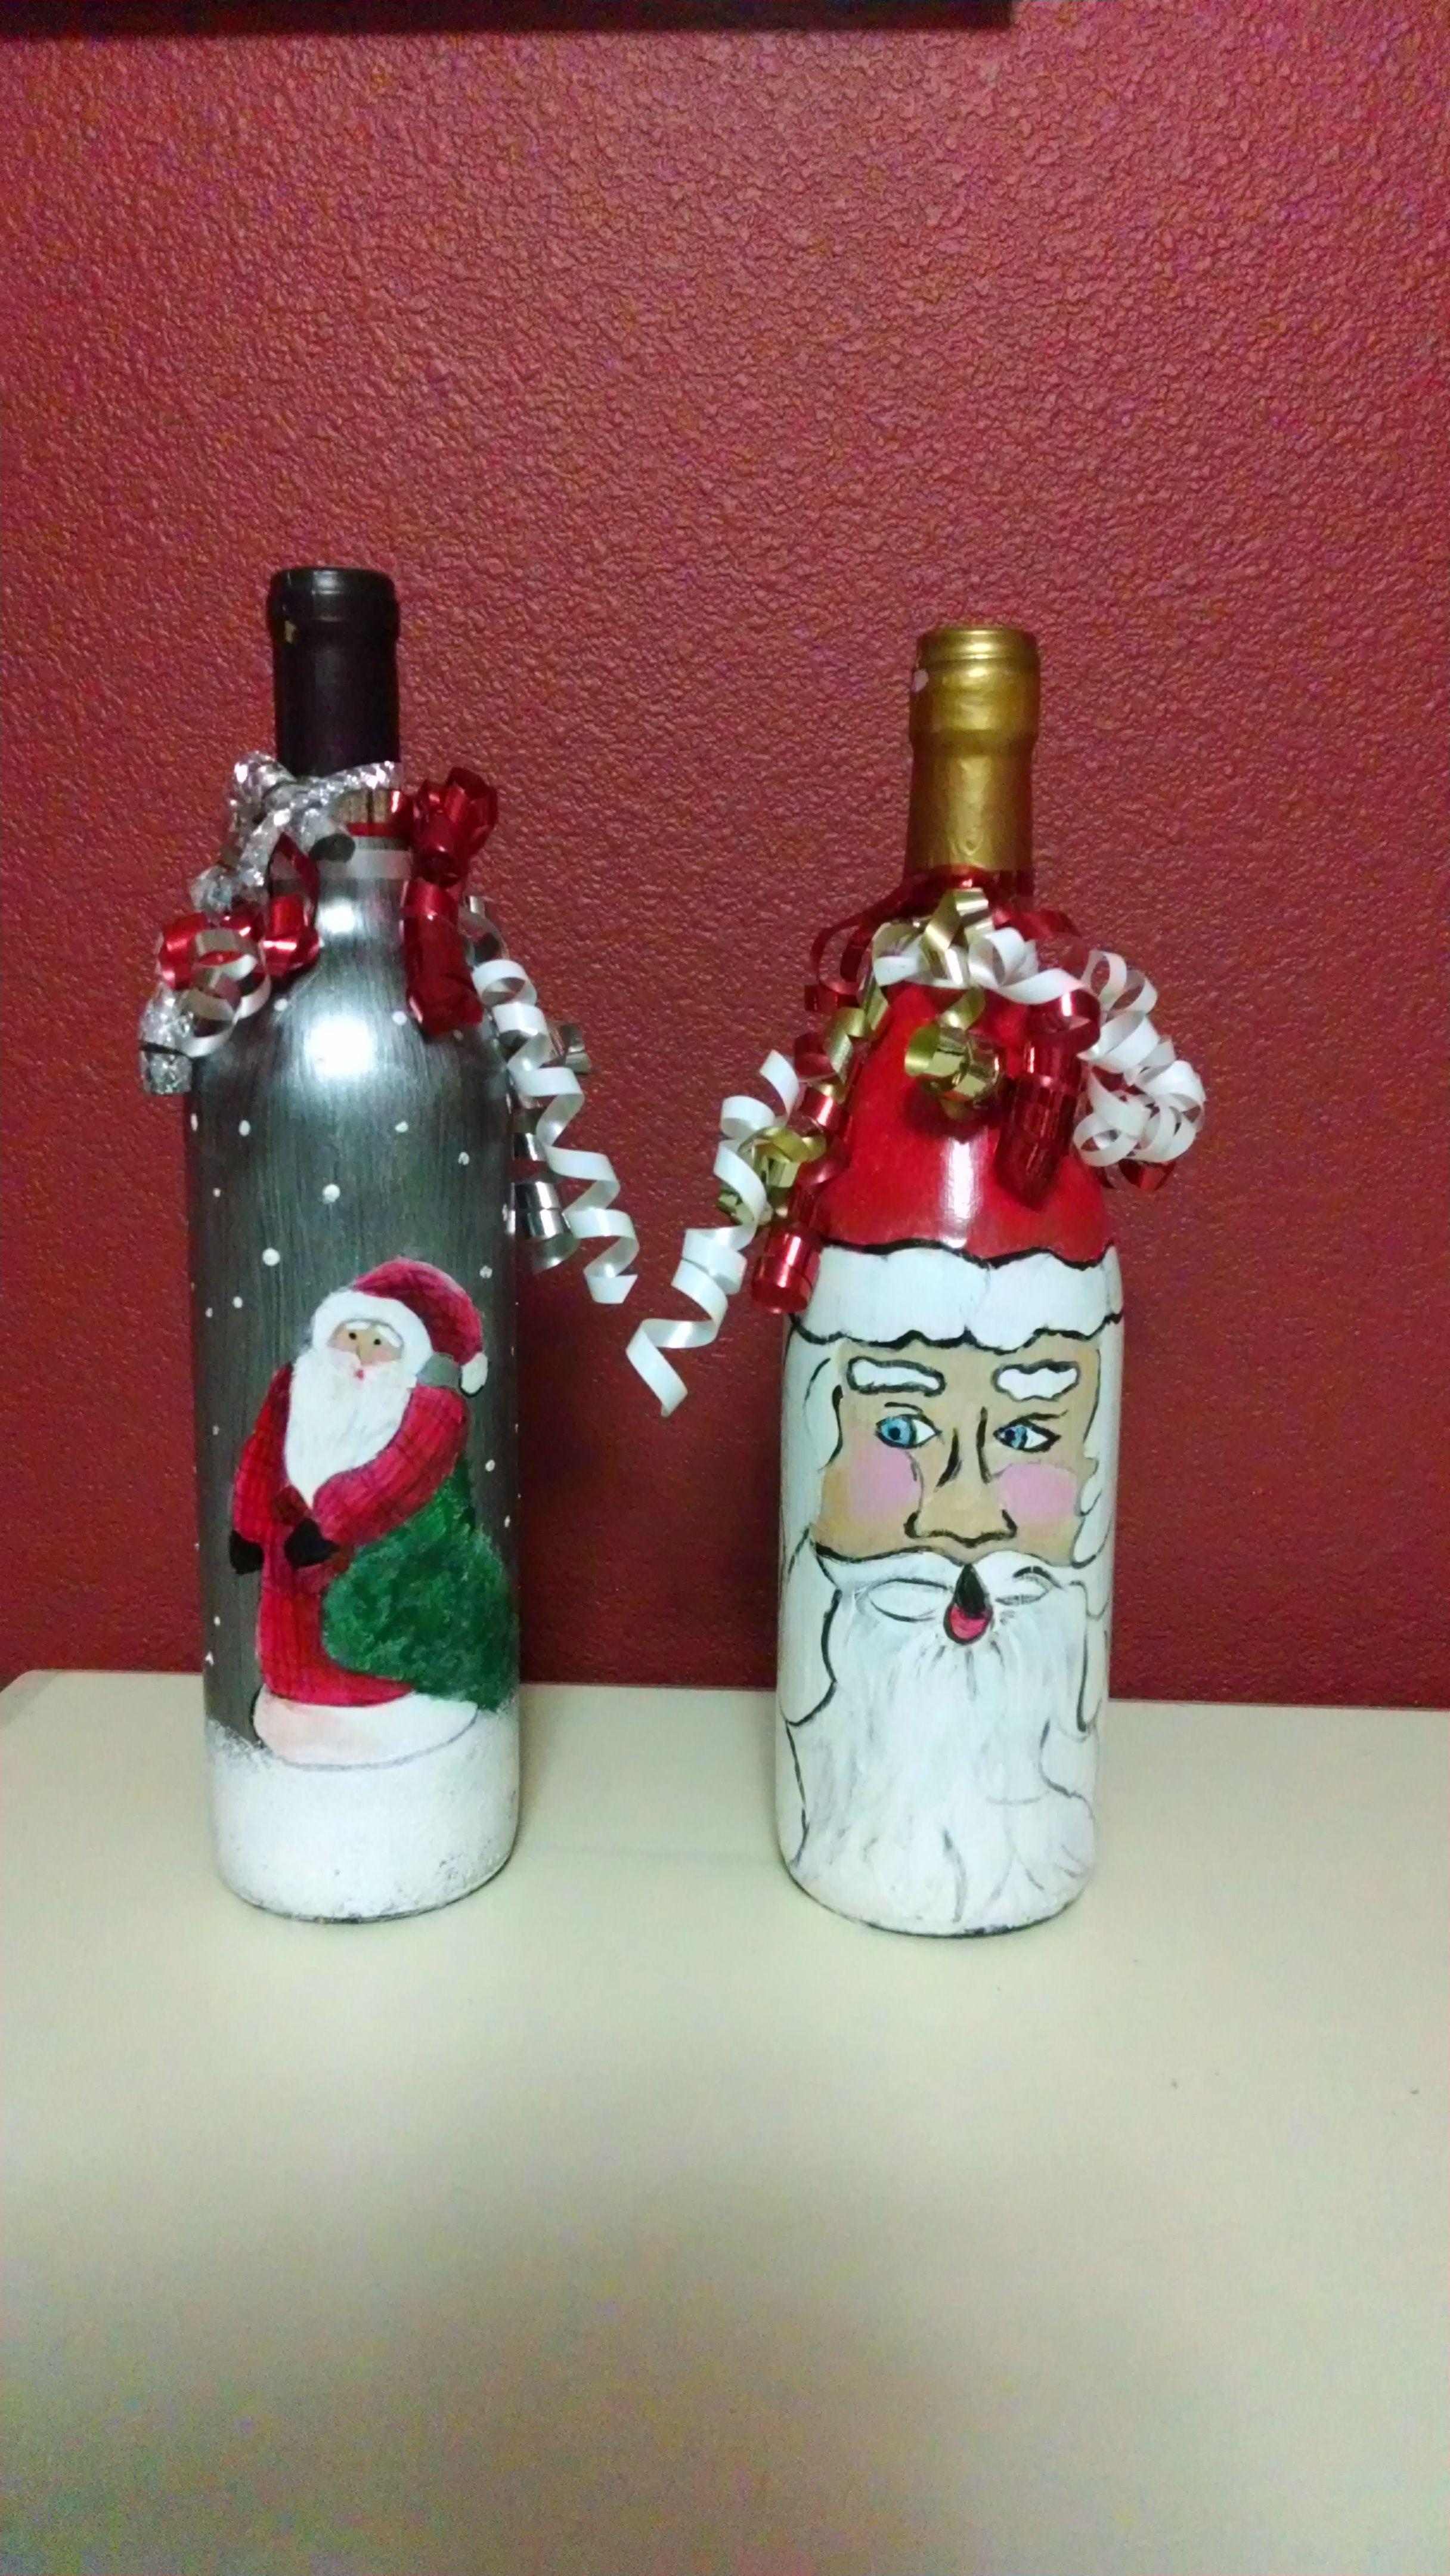 Christmas wine bottles wine bottle craft pinterest for Christmas craft ideas with wine bottles